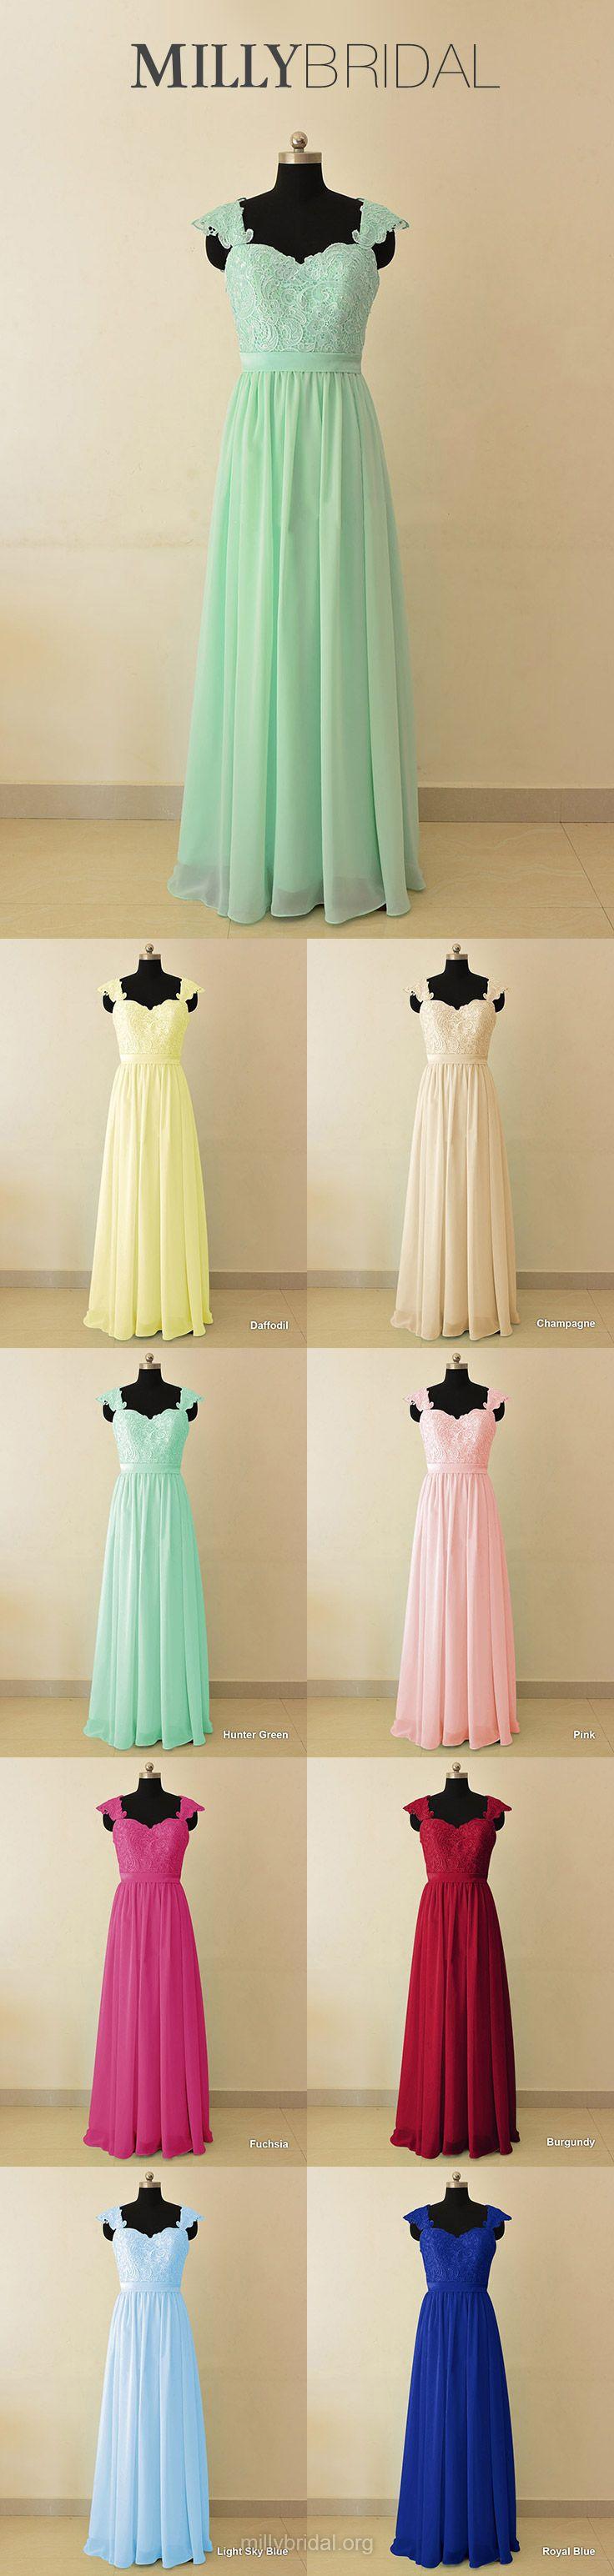 Sage Bridesmaid Dresses Long, Sweetheart Bridesmaid Dress Chiffon, Lace Wedding Party Dresses Modest